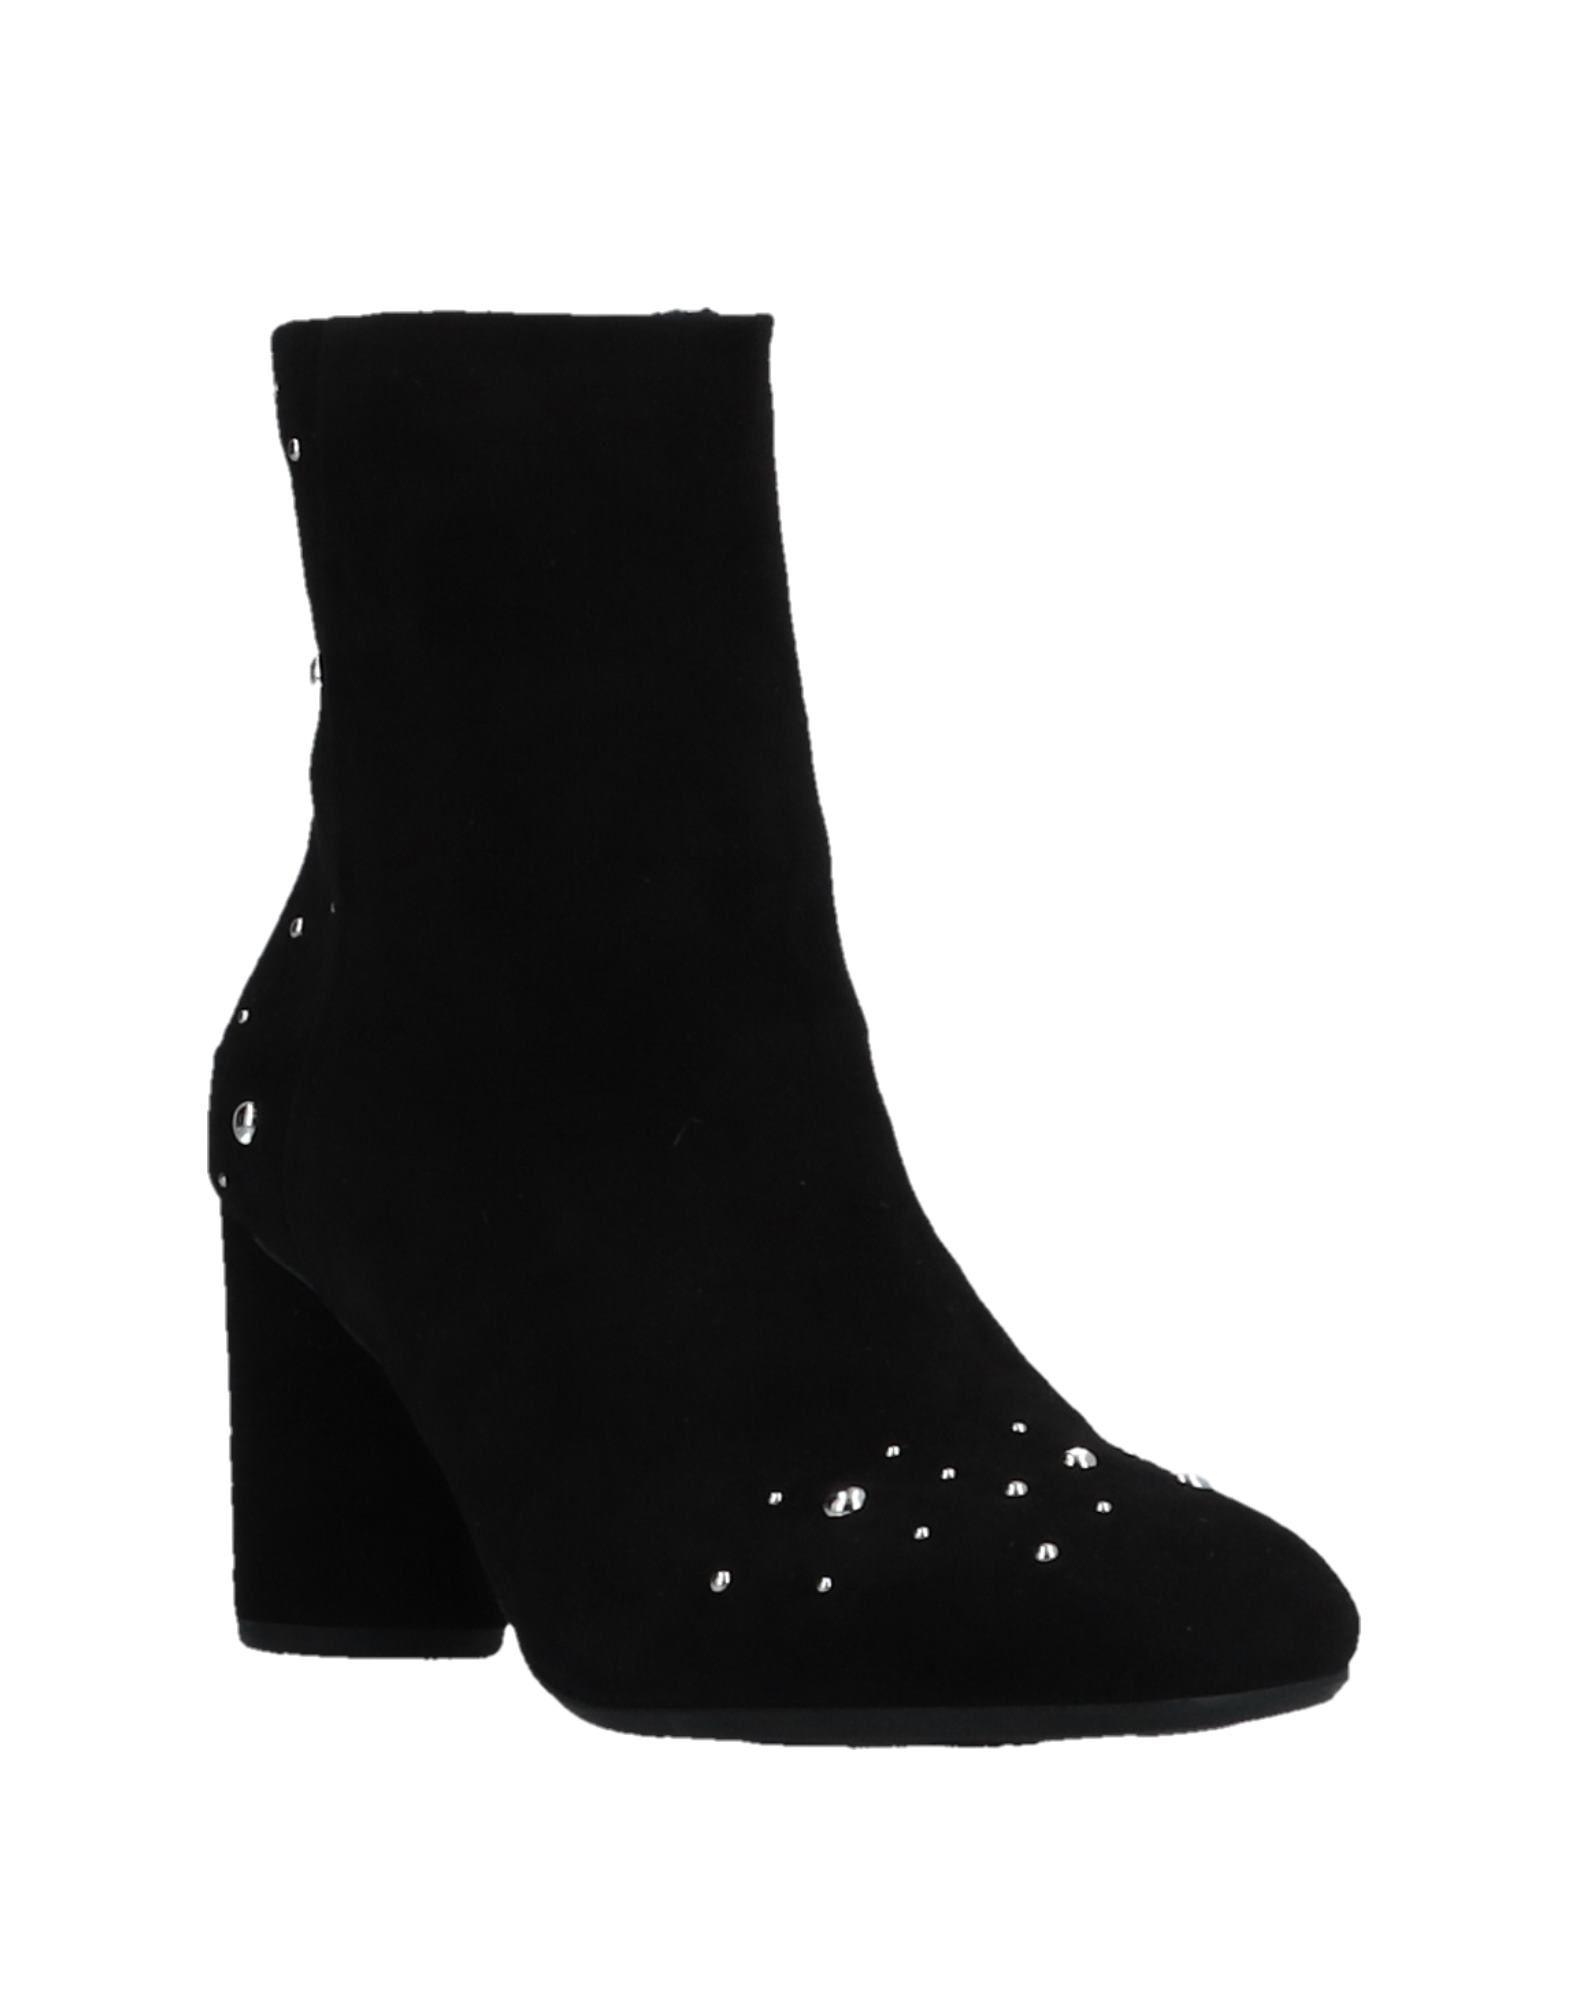 Pas De Rouge Stiefelette Damen Schuhe  11510784XQGut aussehende strapazierfähige Schuhe Damen 536713